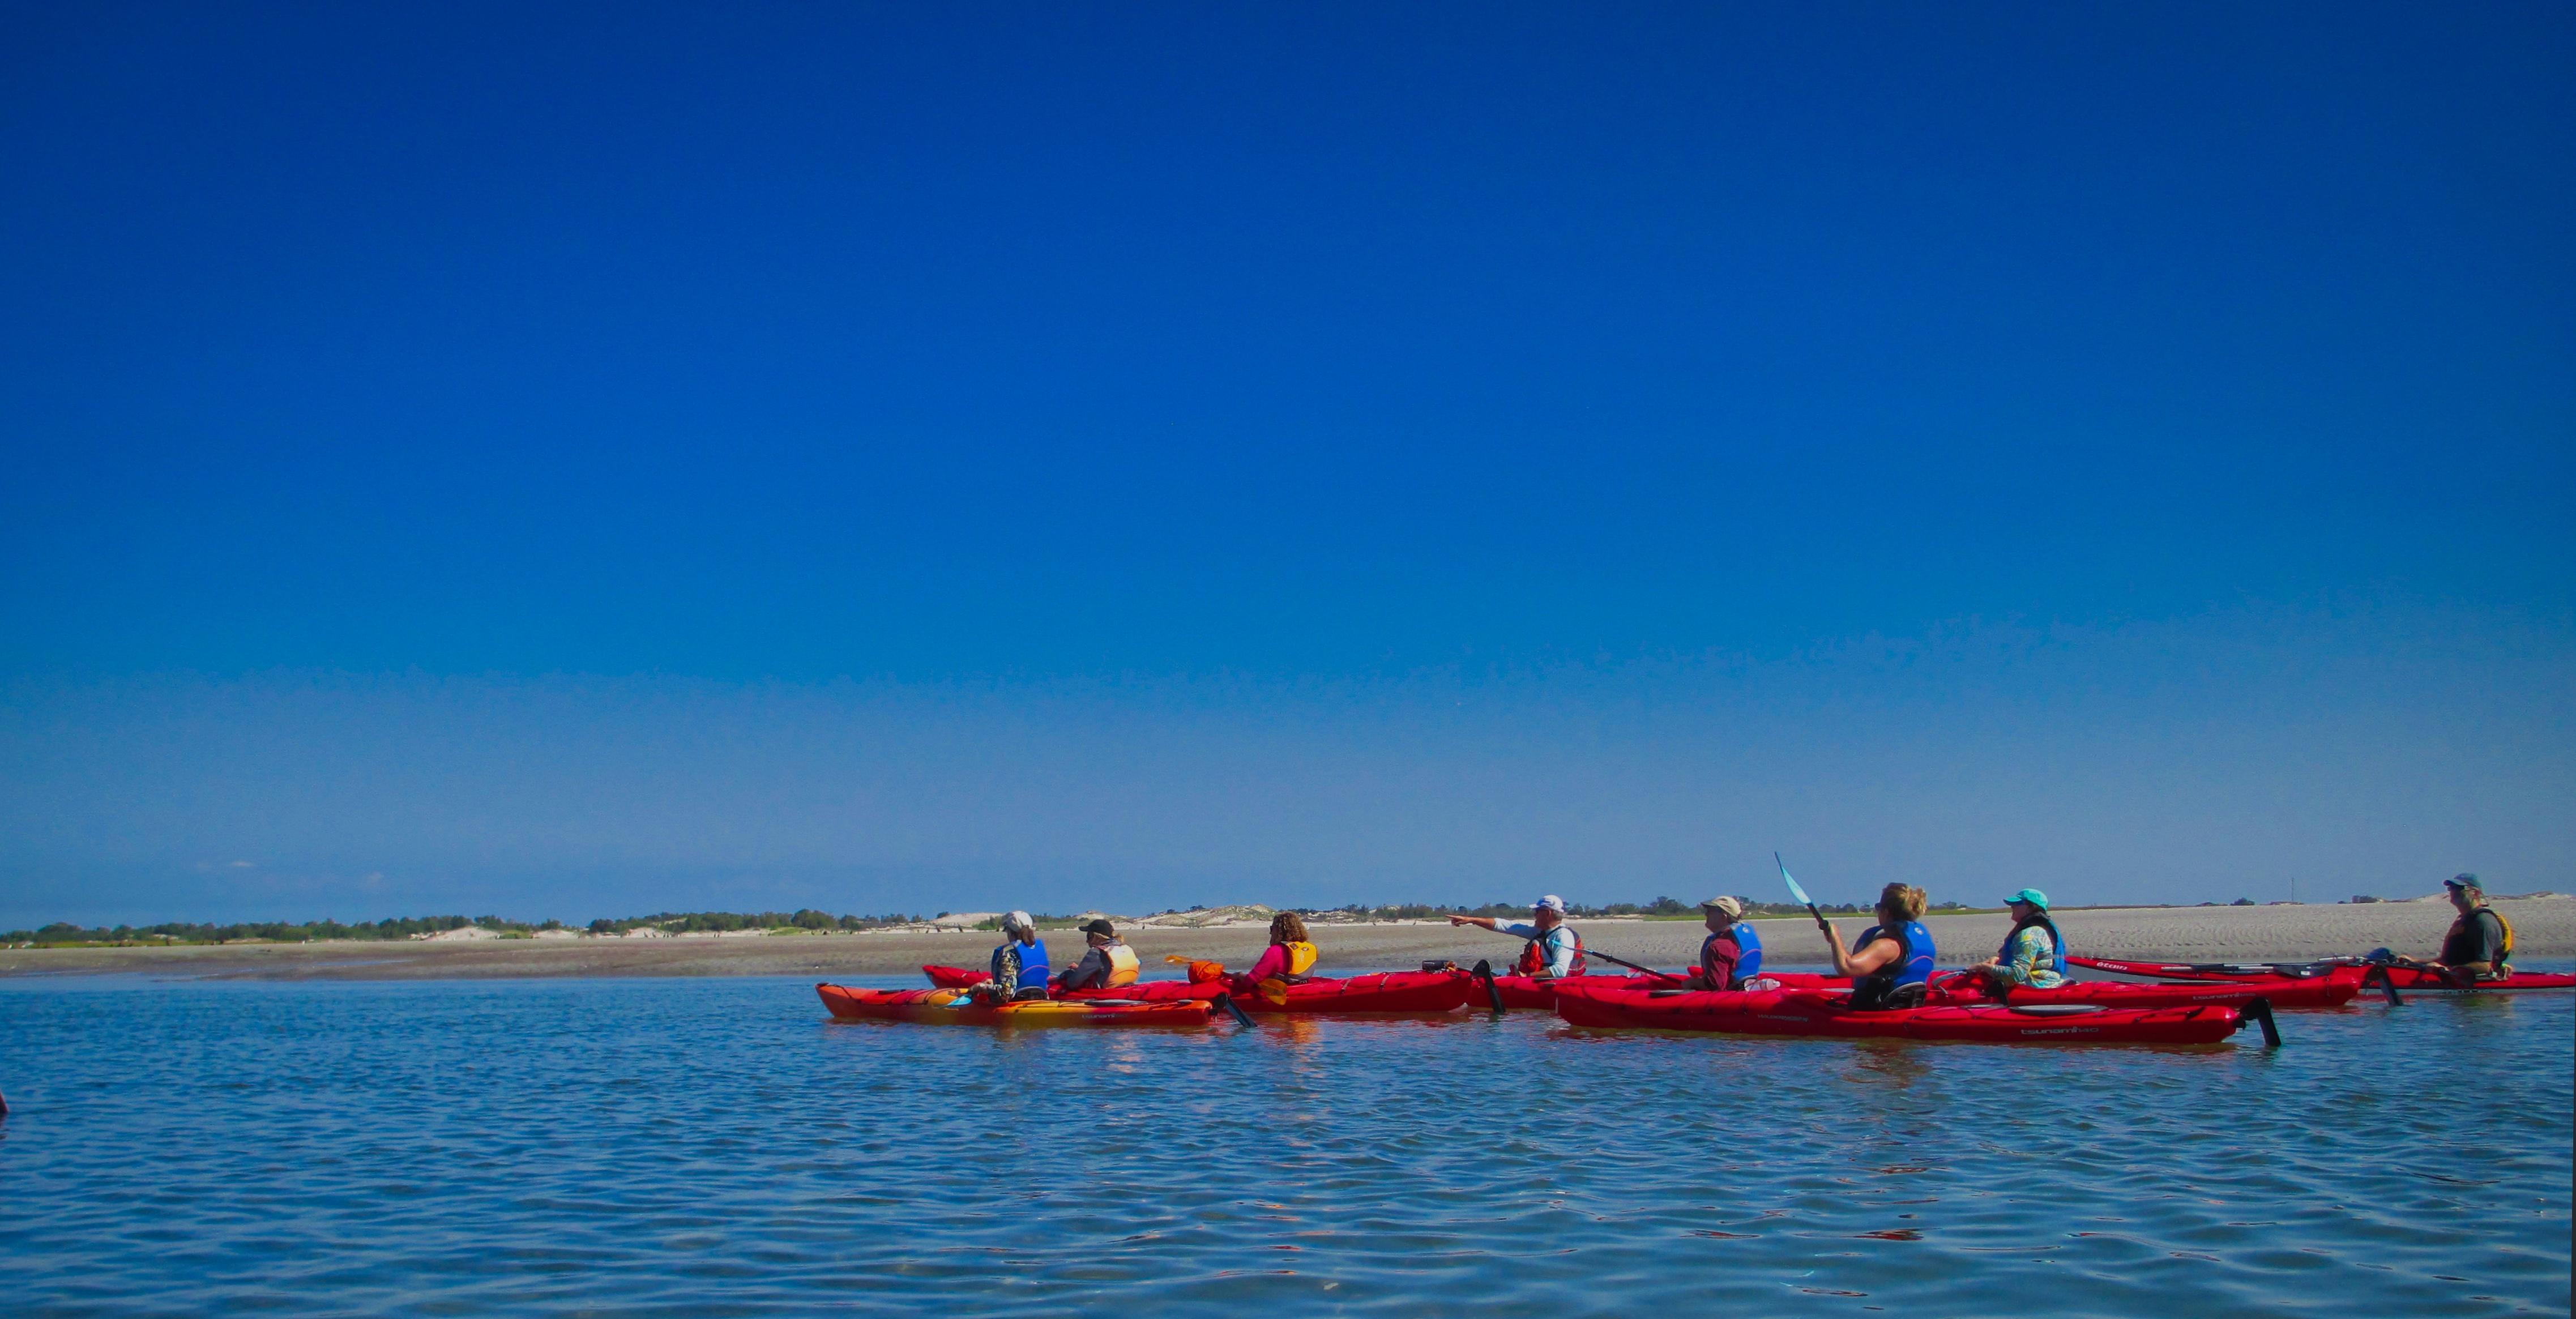 Paddling-Choate-Island-Channel